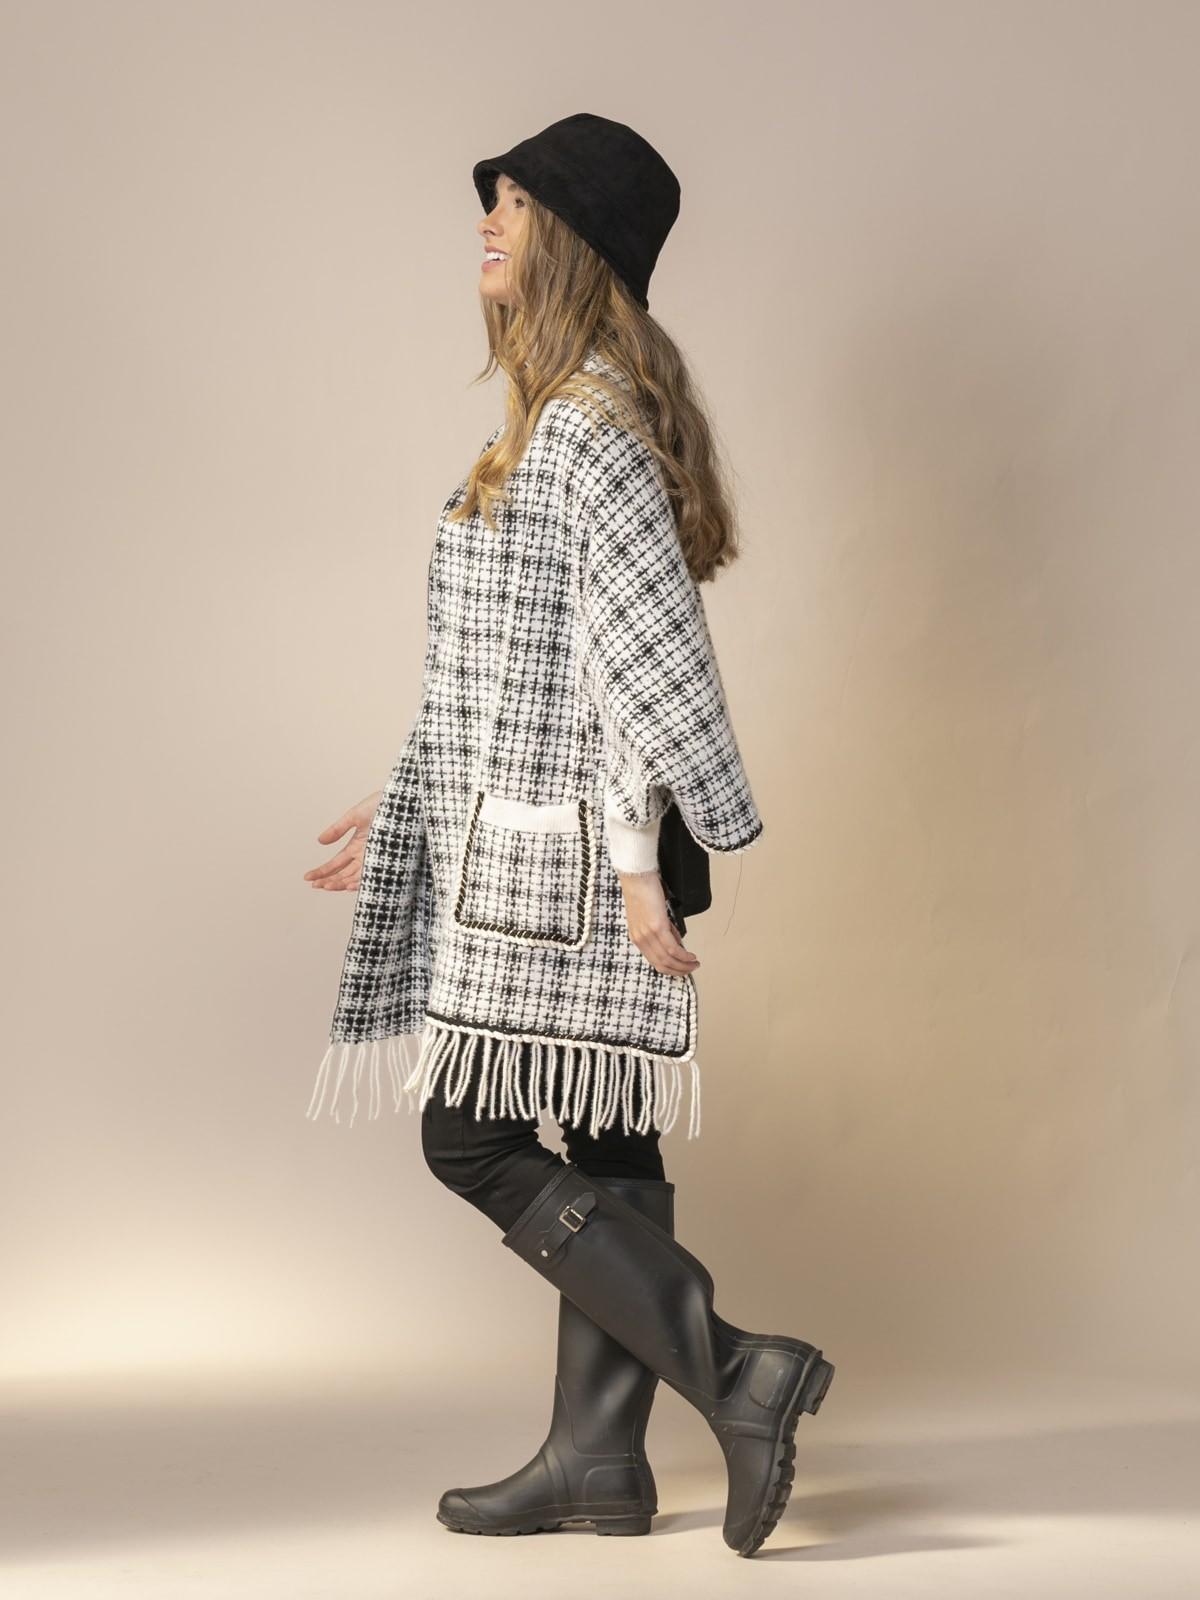 Poncho mujer tejido chanel lana Blanco